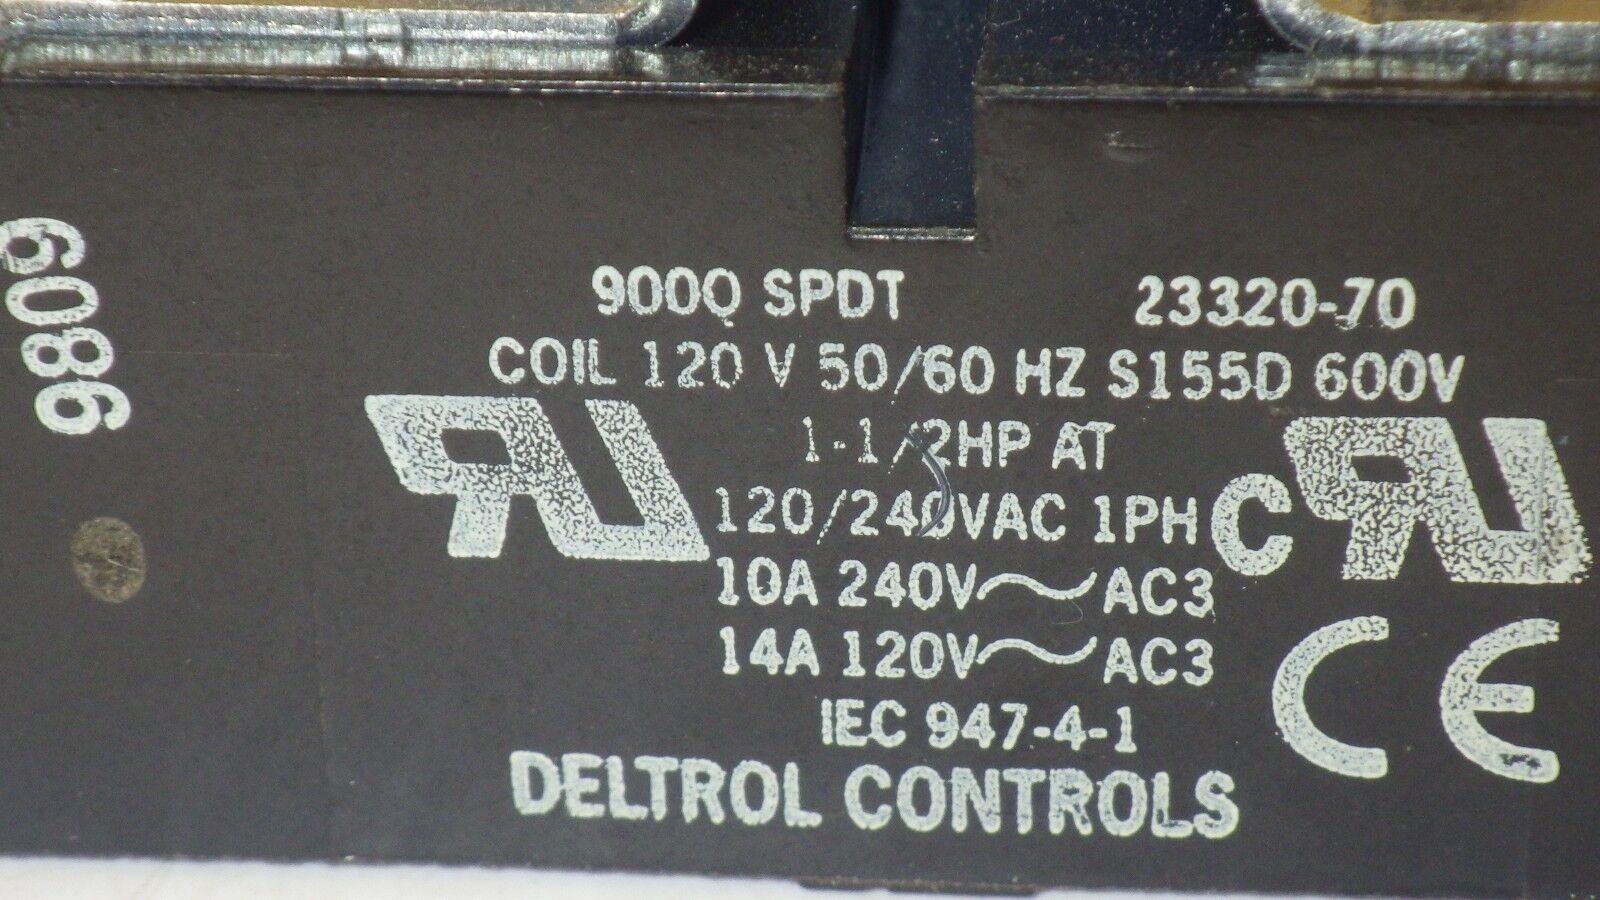 Deltrol Controls 900q Spdt 23320 70 Power Relay T96748 Ebay Solid State 5v